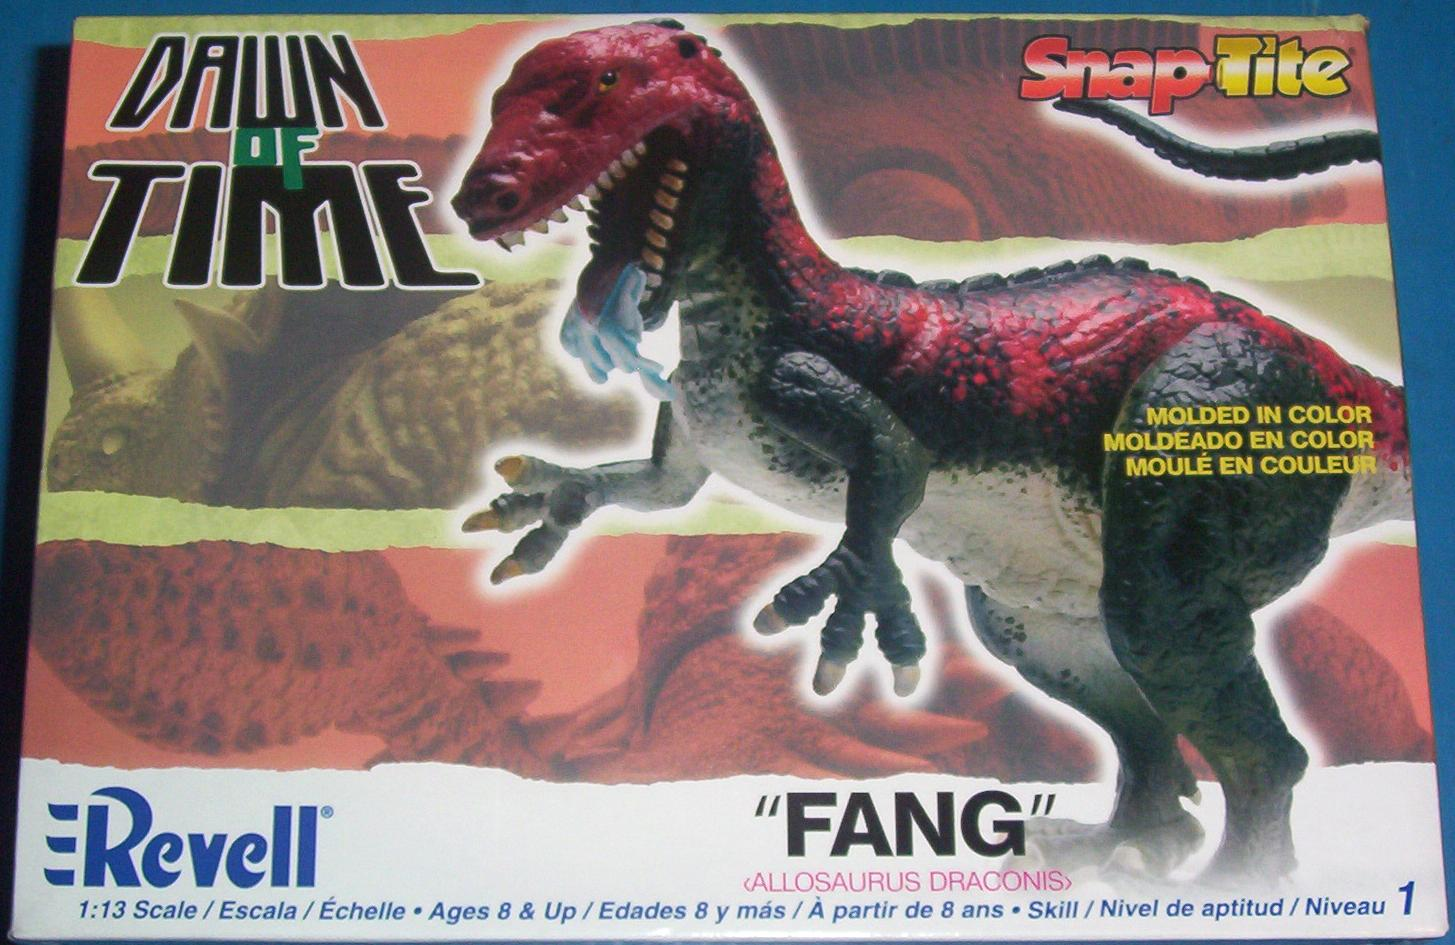 Revell 2007 allosaurus dinosaur model box